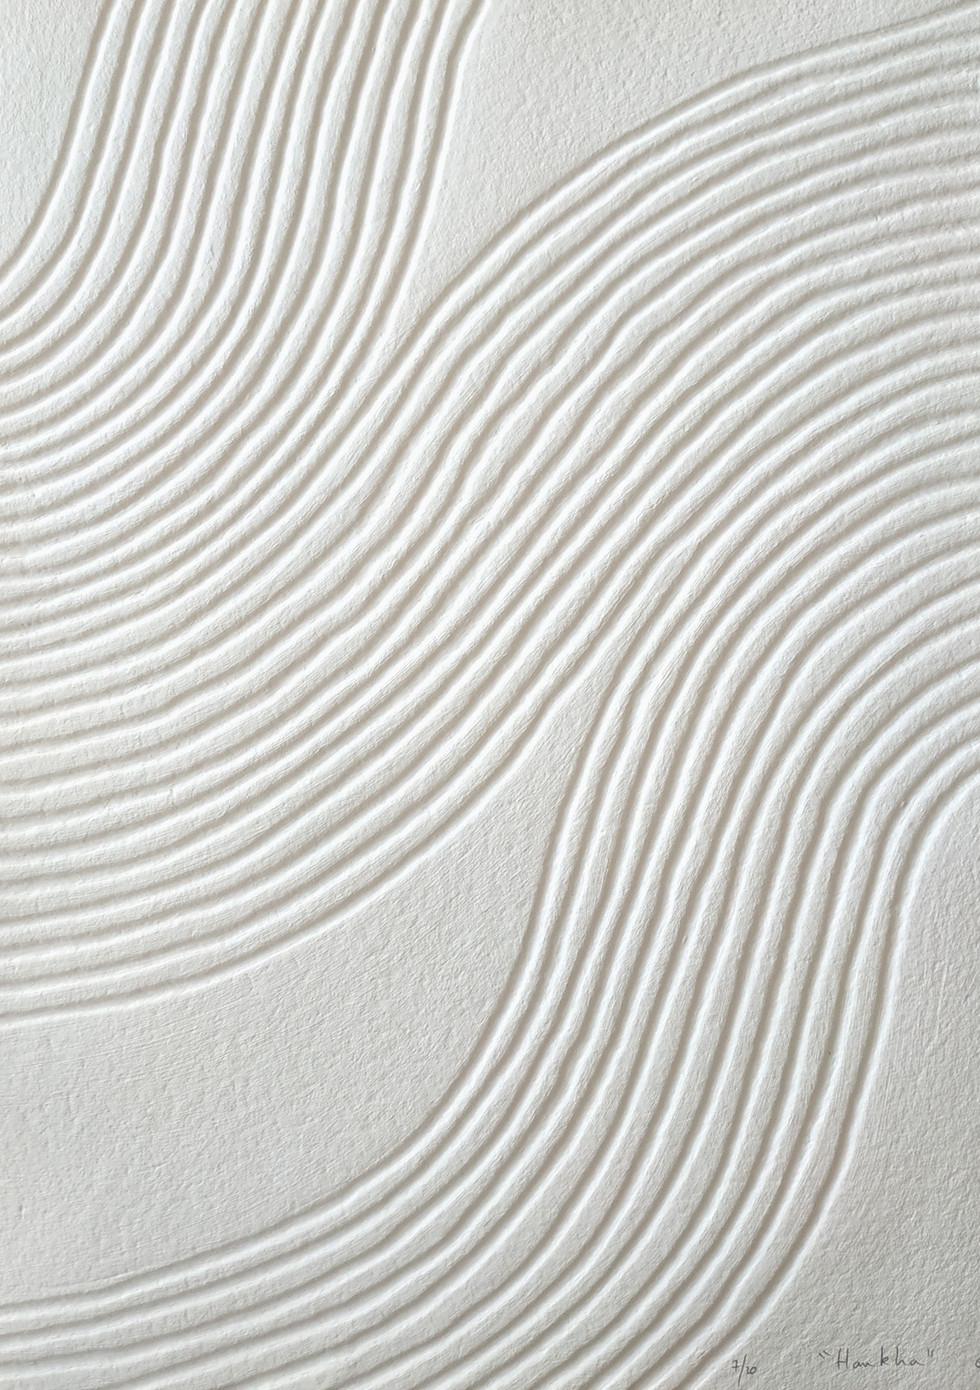 Hankha Papierreliefabdruck, 20 Ex., 77 x 56 cm, verso sign. & num. - verkauft -